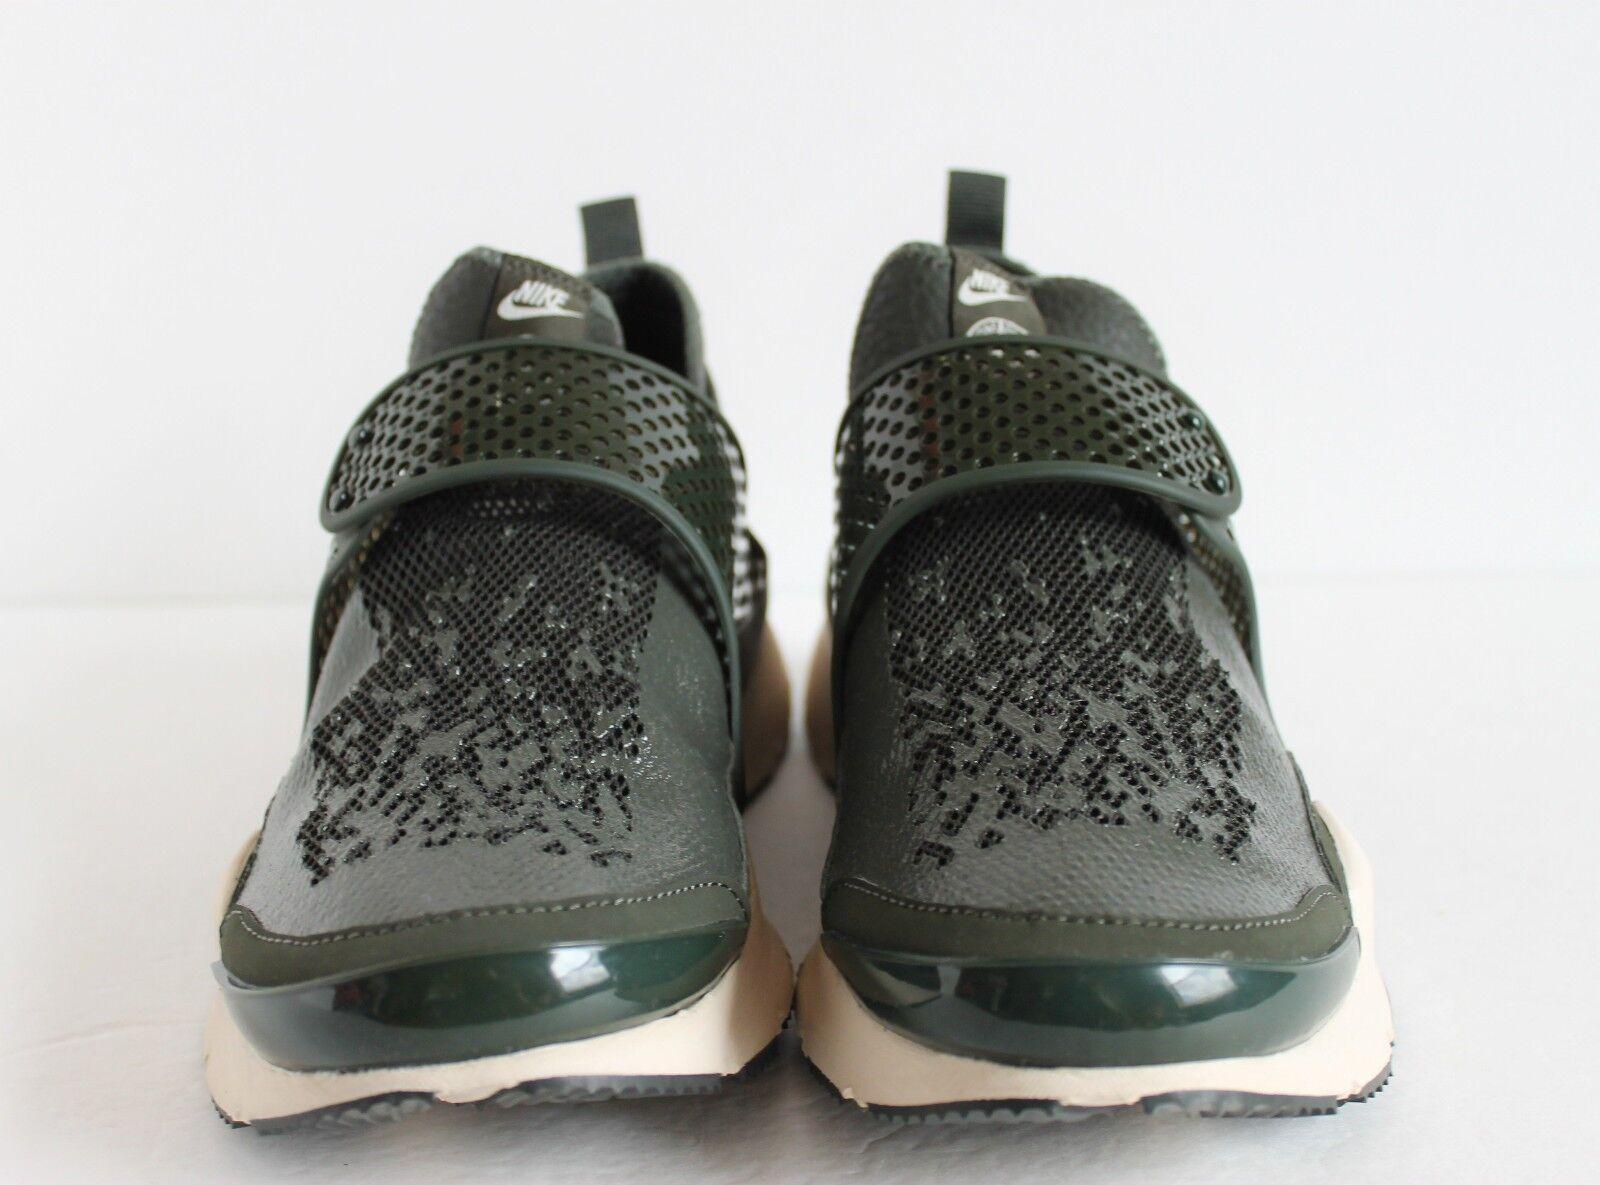 Nike zoom stefan janoski su scivolare su janoski qs 脳 polari taglia 10 400 nuovi ah6713 tuono blu e7beb4